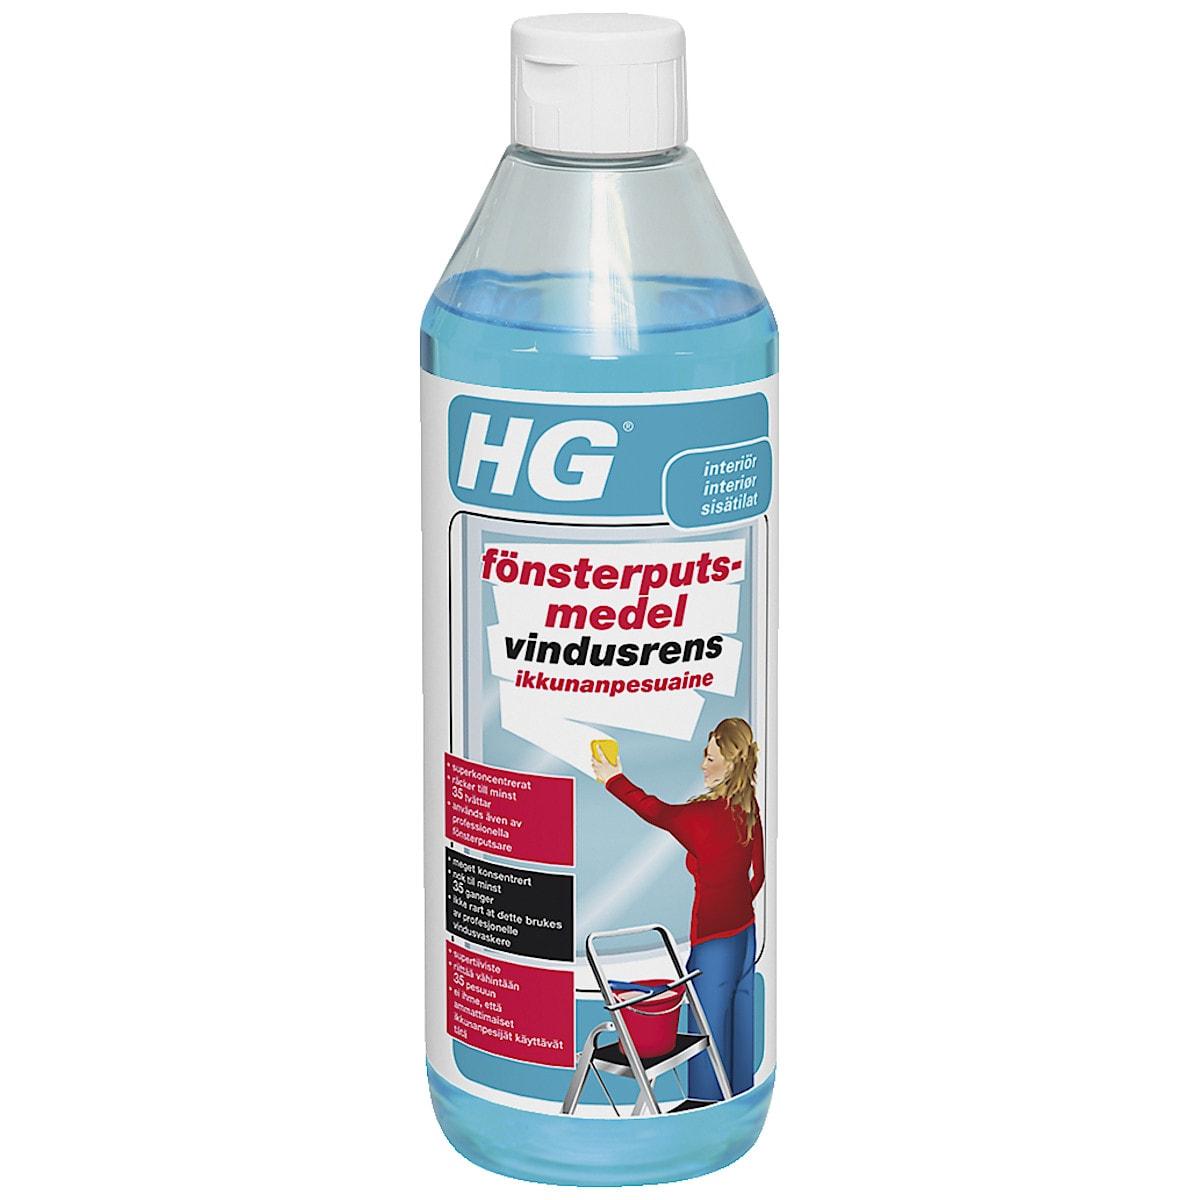 Ikkunanpesuaine HG